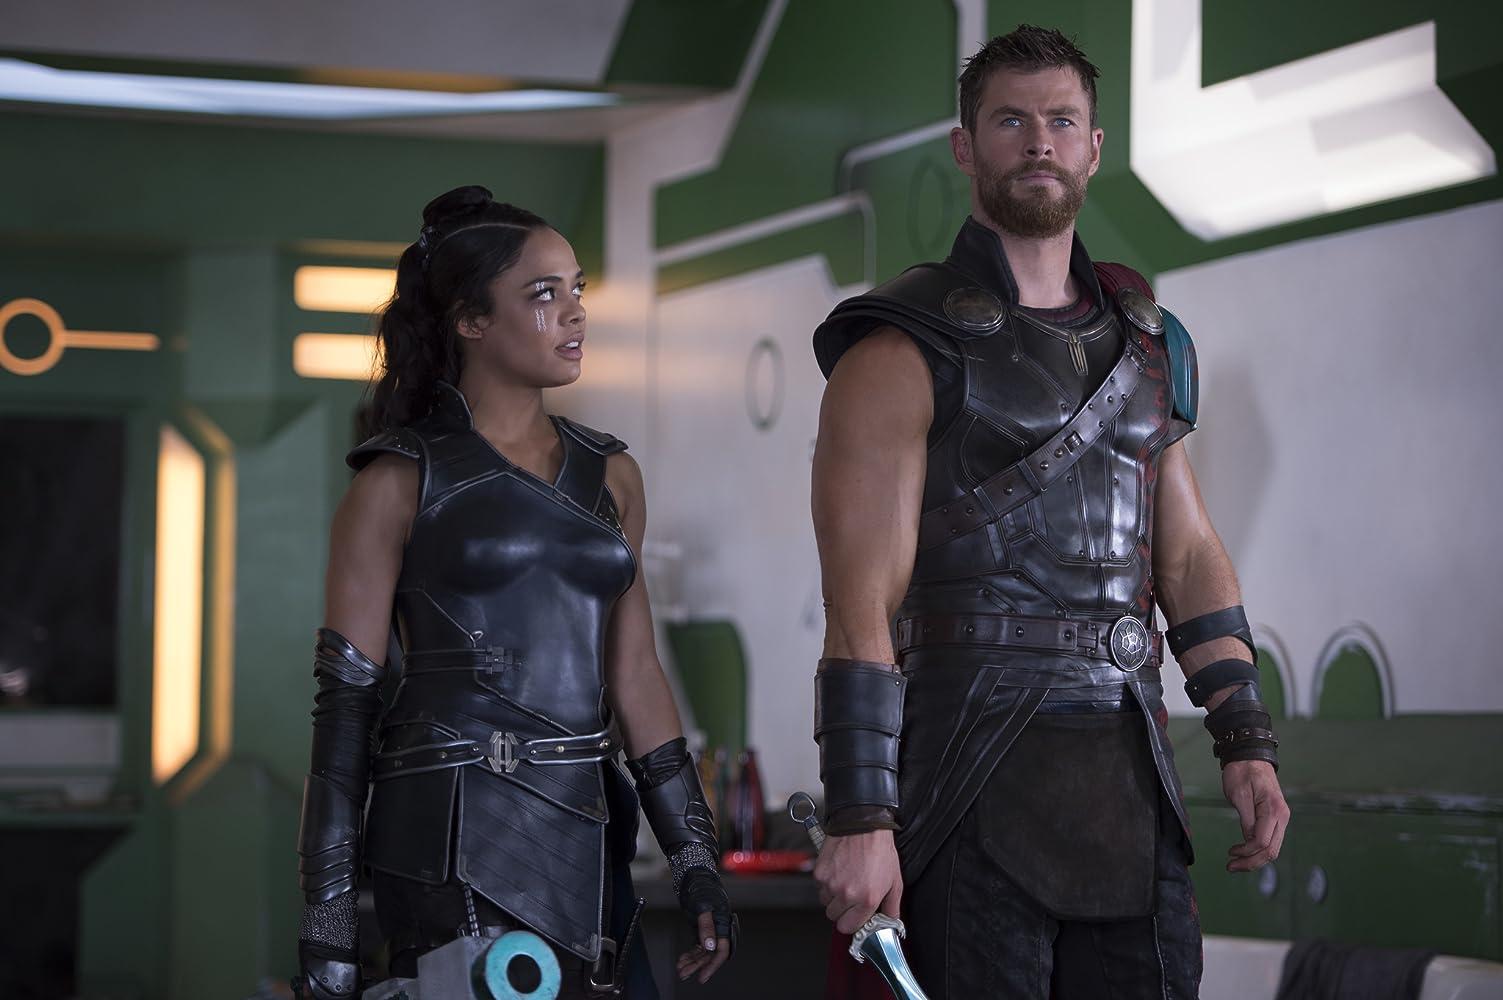 Chris Hemsworth and Tessa Thompson in Thor: Ragnarok (2017)